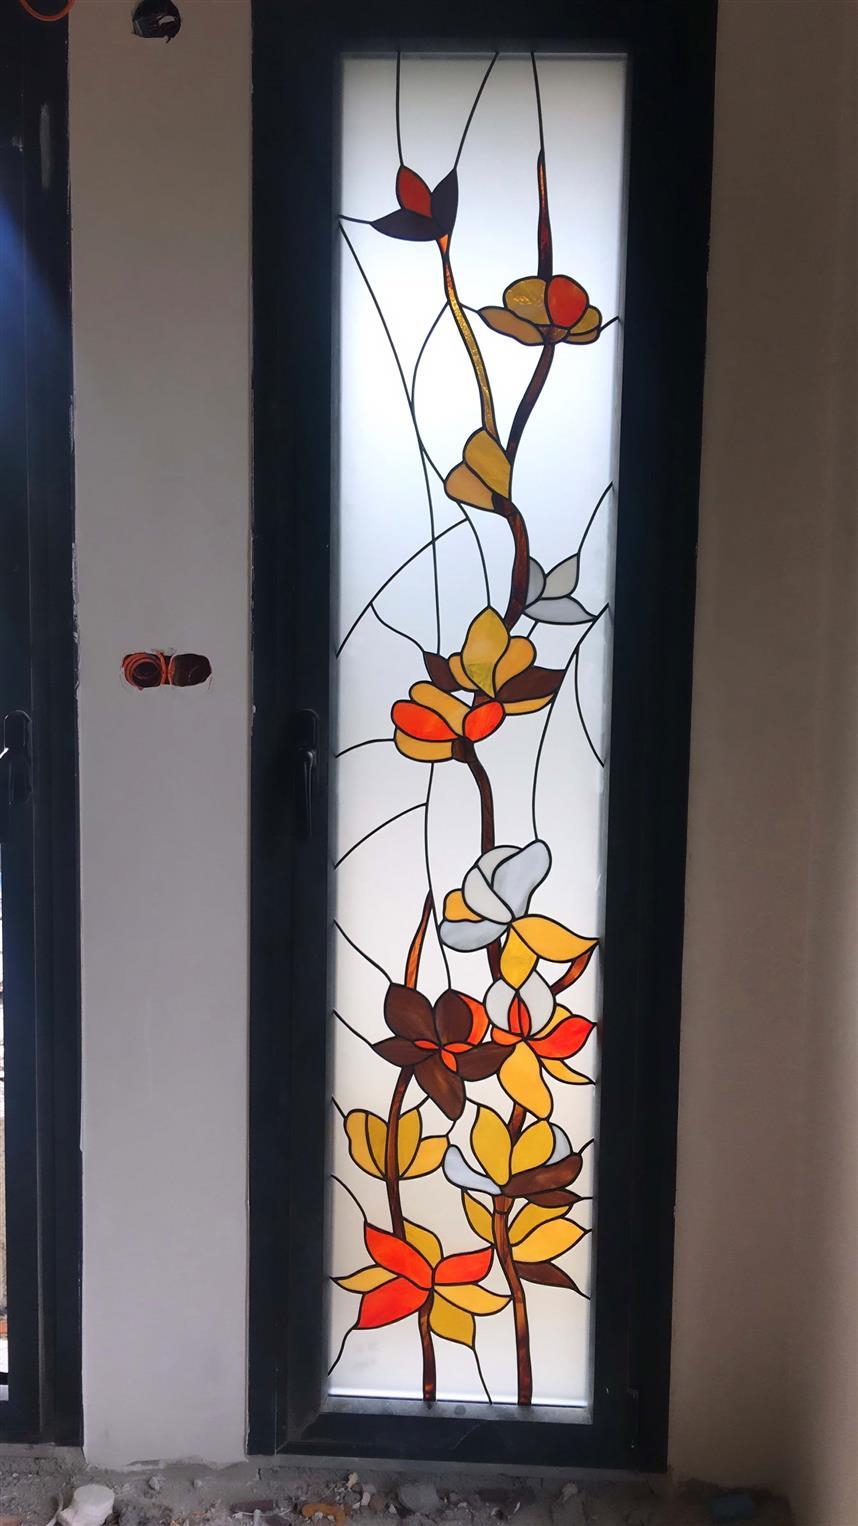 limanreis-narlidere-villa2020120182137704.jpg izmir vitray çalışması